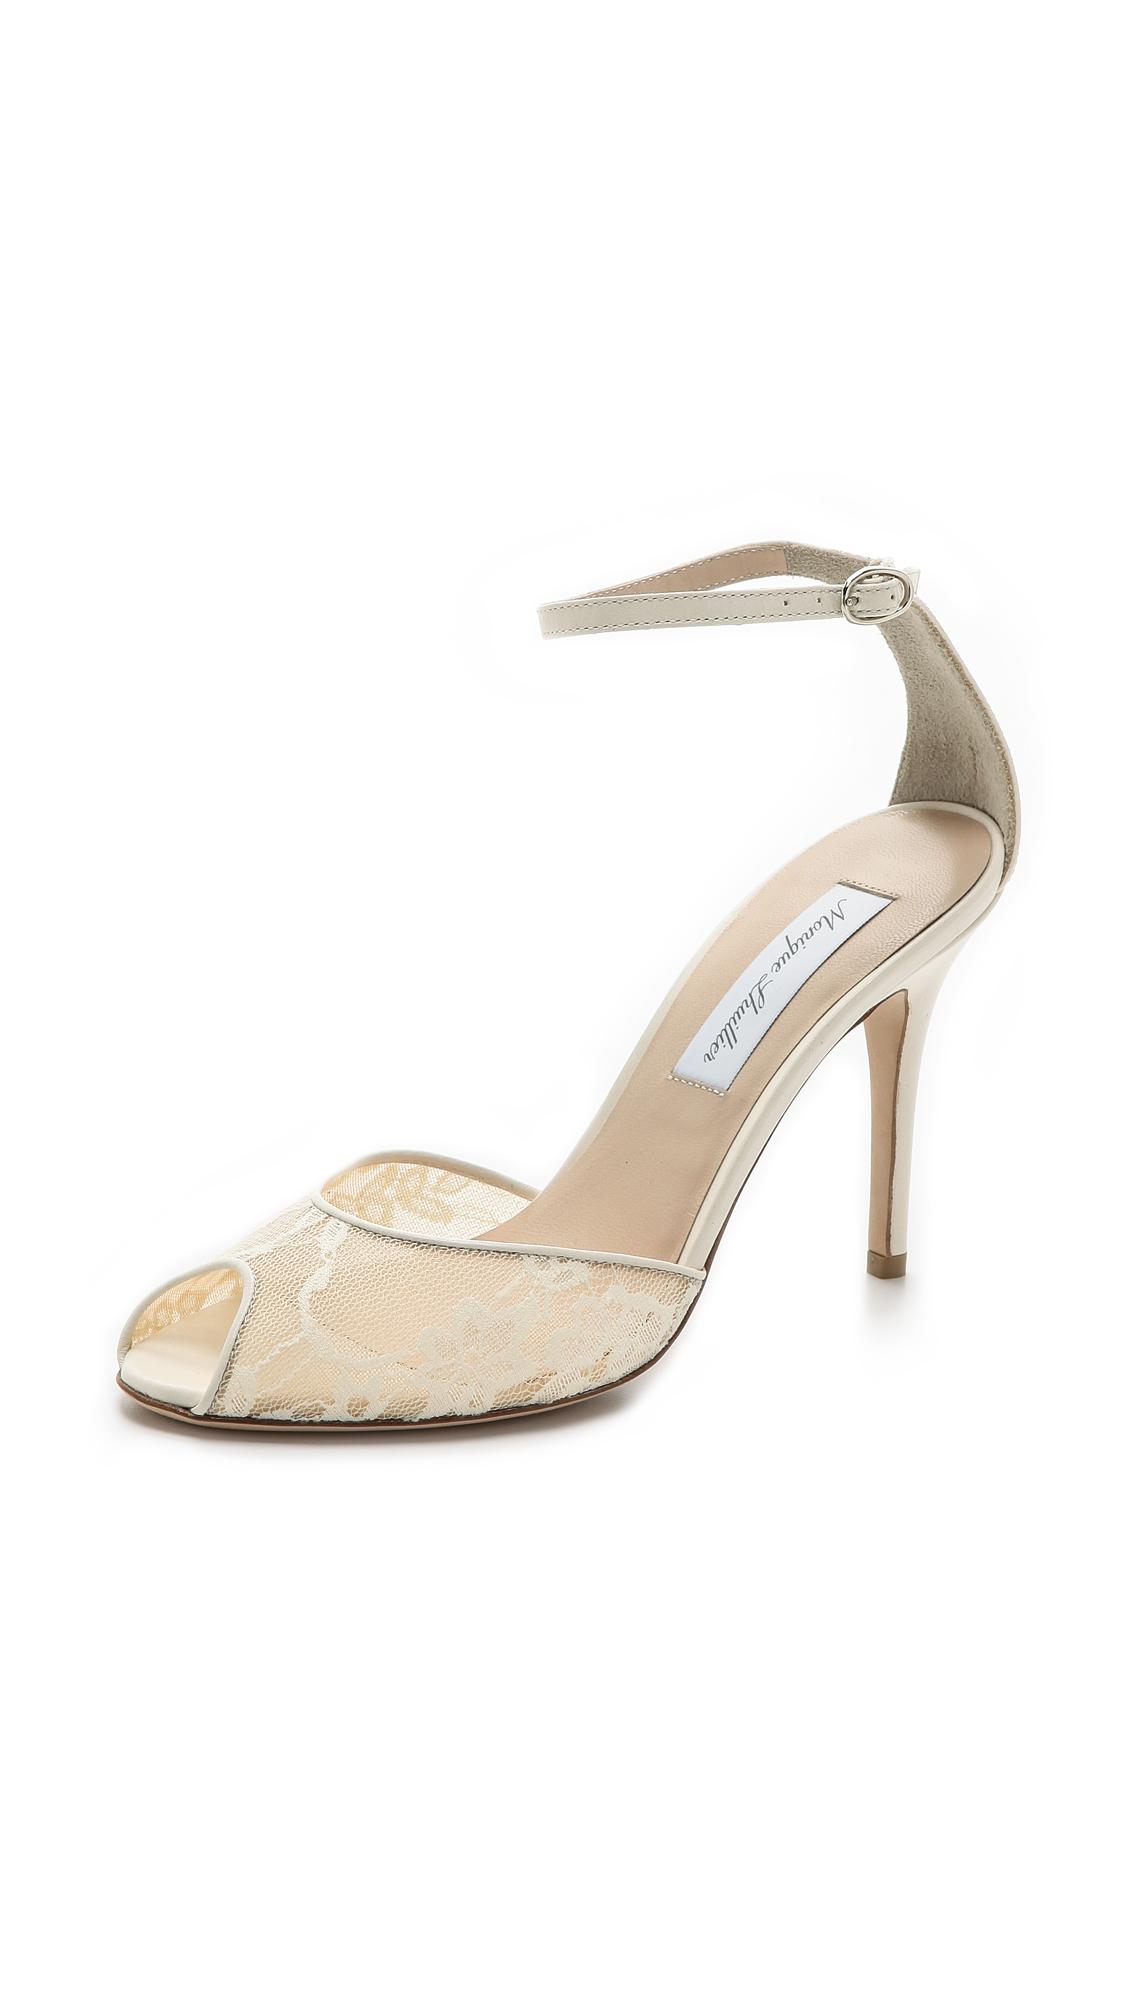 monique lhuillier lace peep toe sandals ivory in beige. Black Bedroom Furniture Sets. Home Design Ideas